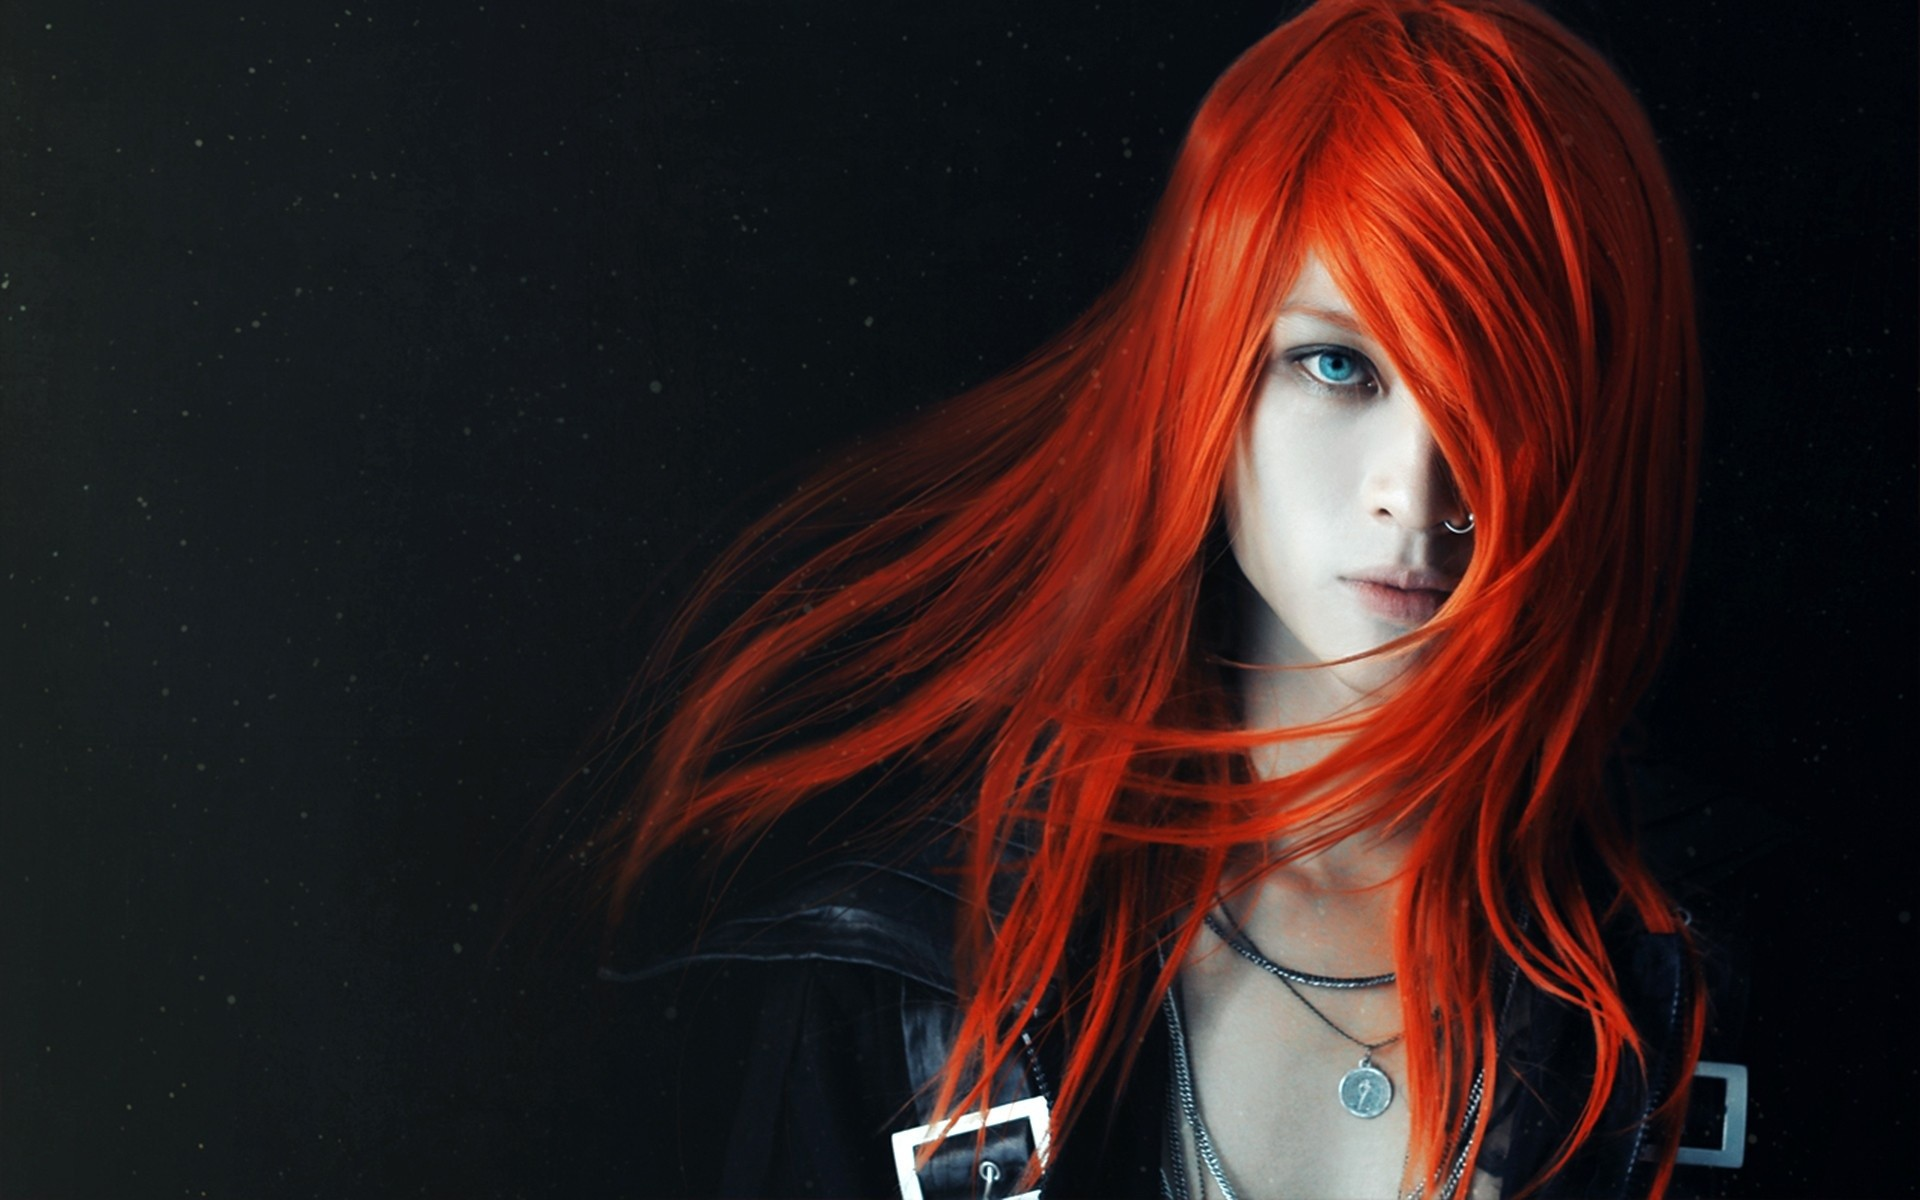 Tori Praver Redhead wallpapers and stock photos